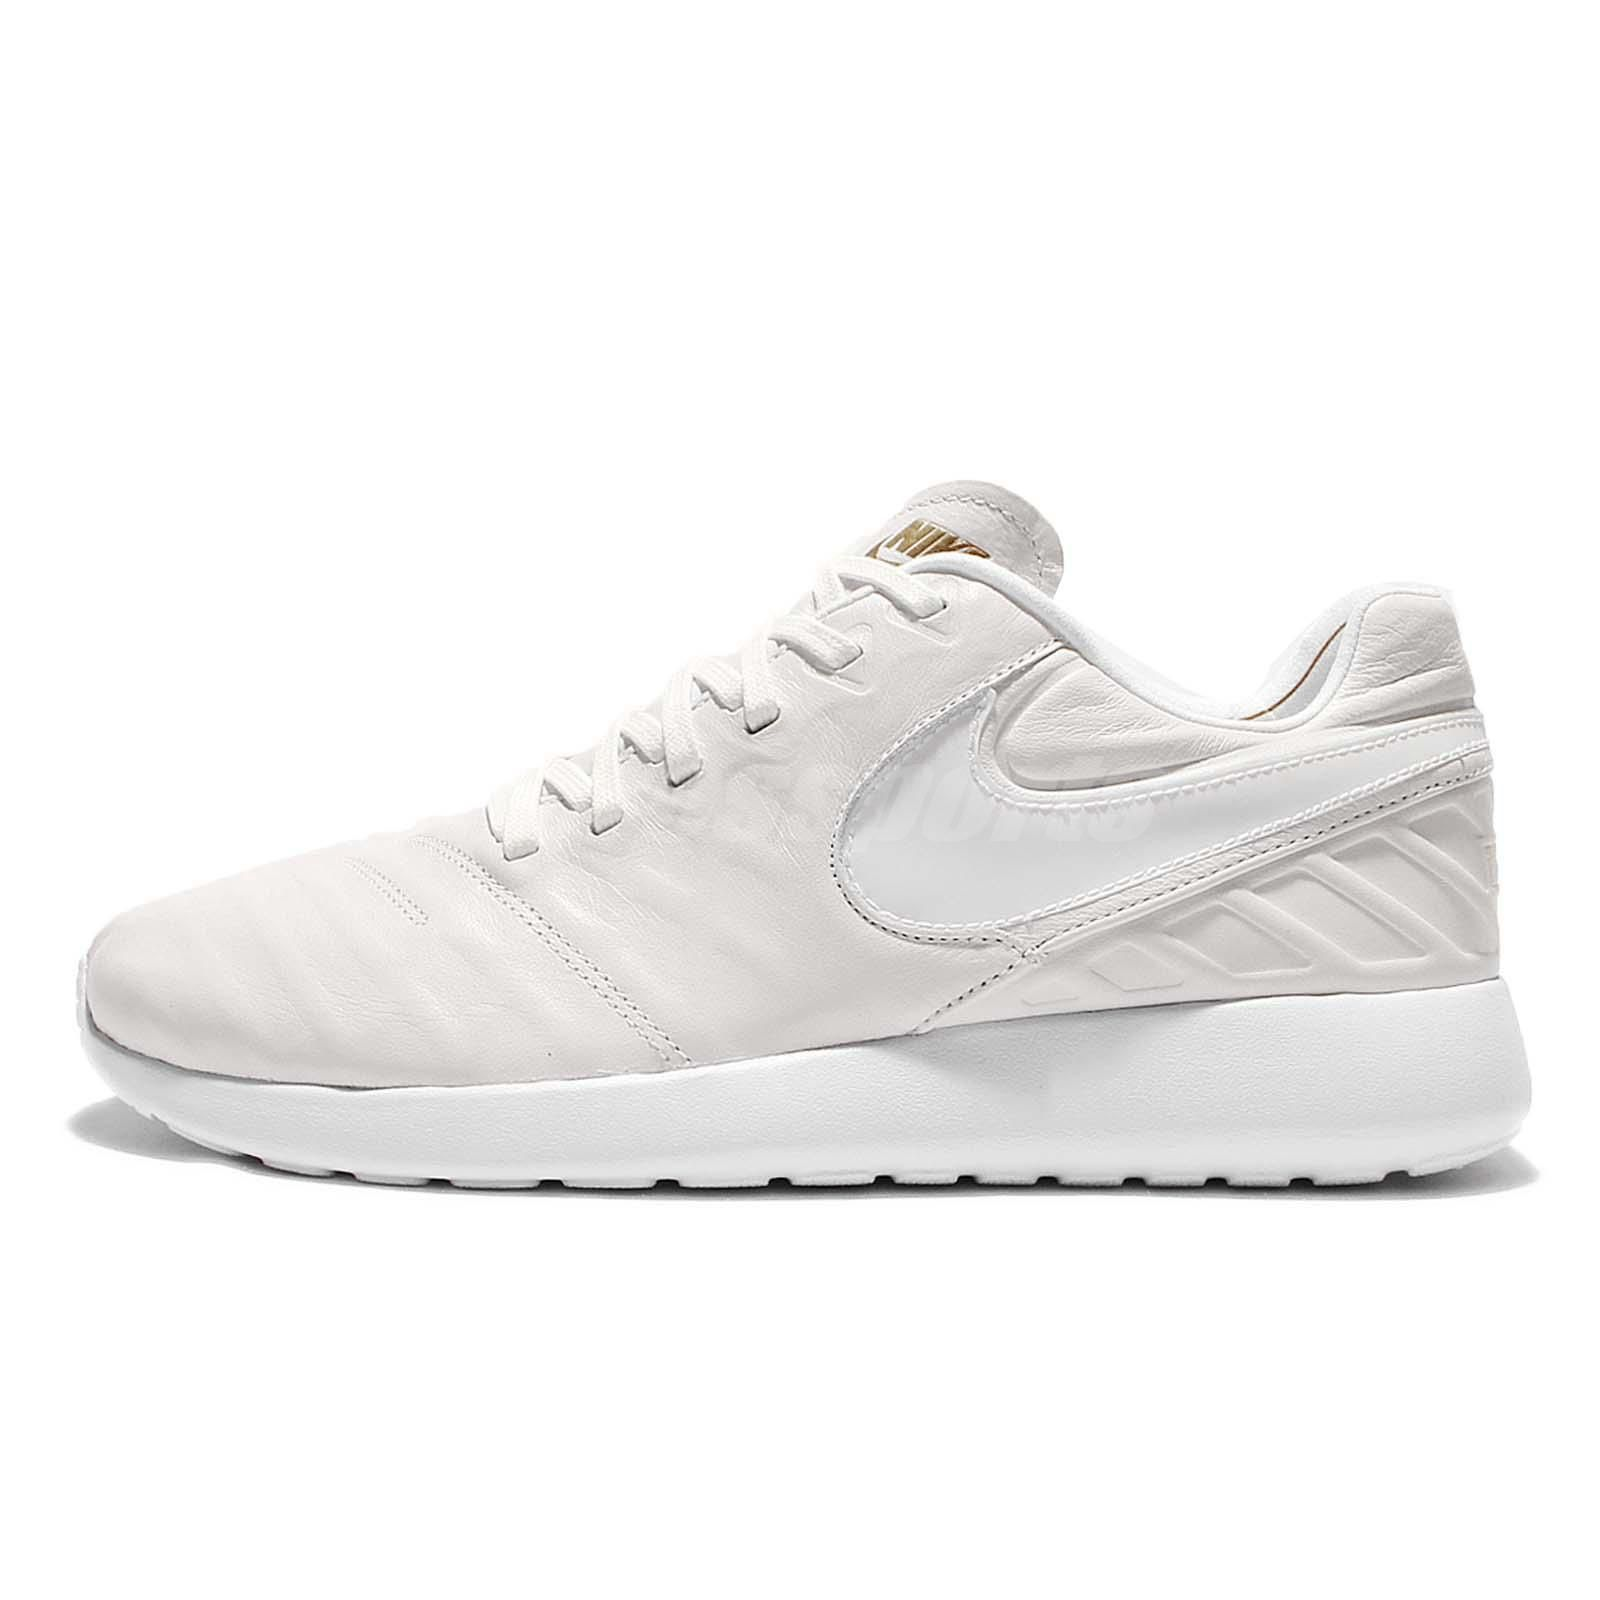 29746e1a82f40 Nike Roshe Tiempo VI QS One Run White Leather Mens Running Shoes 853535-117